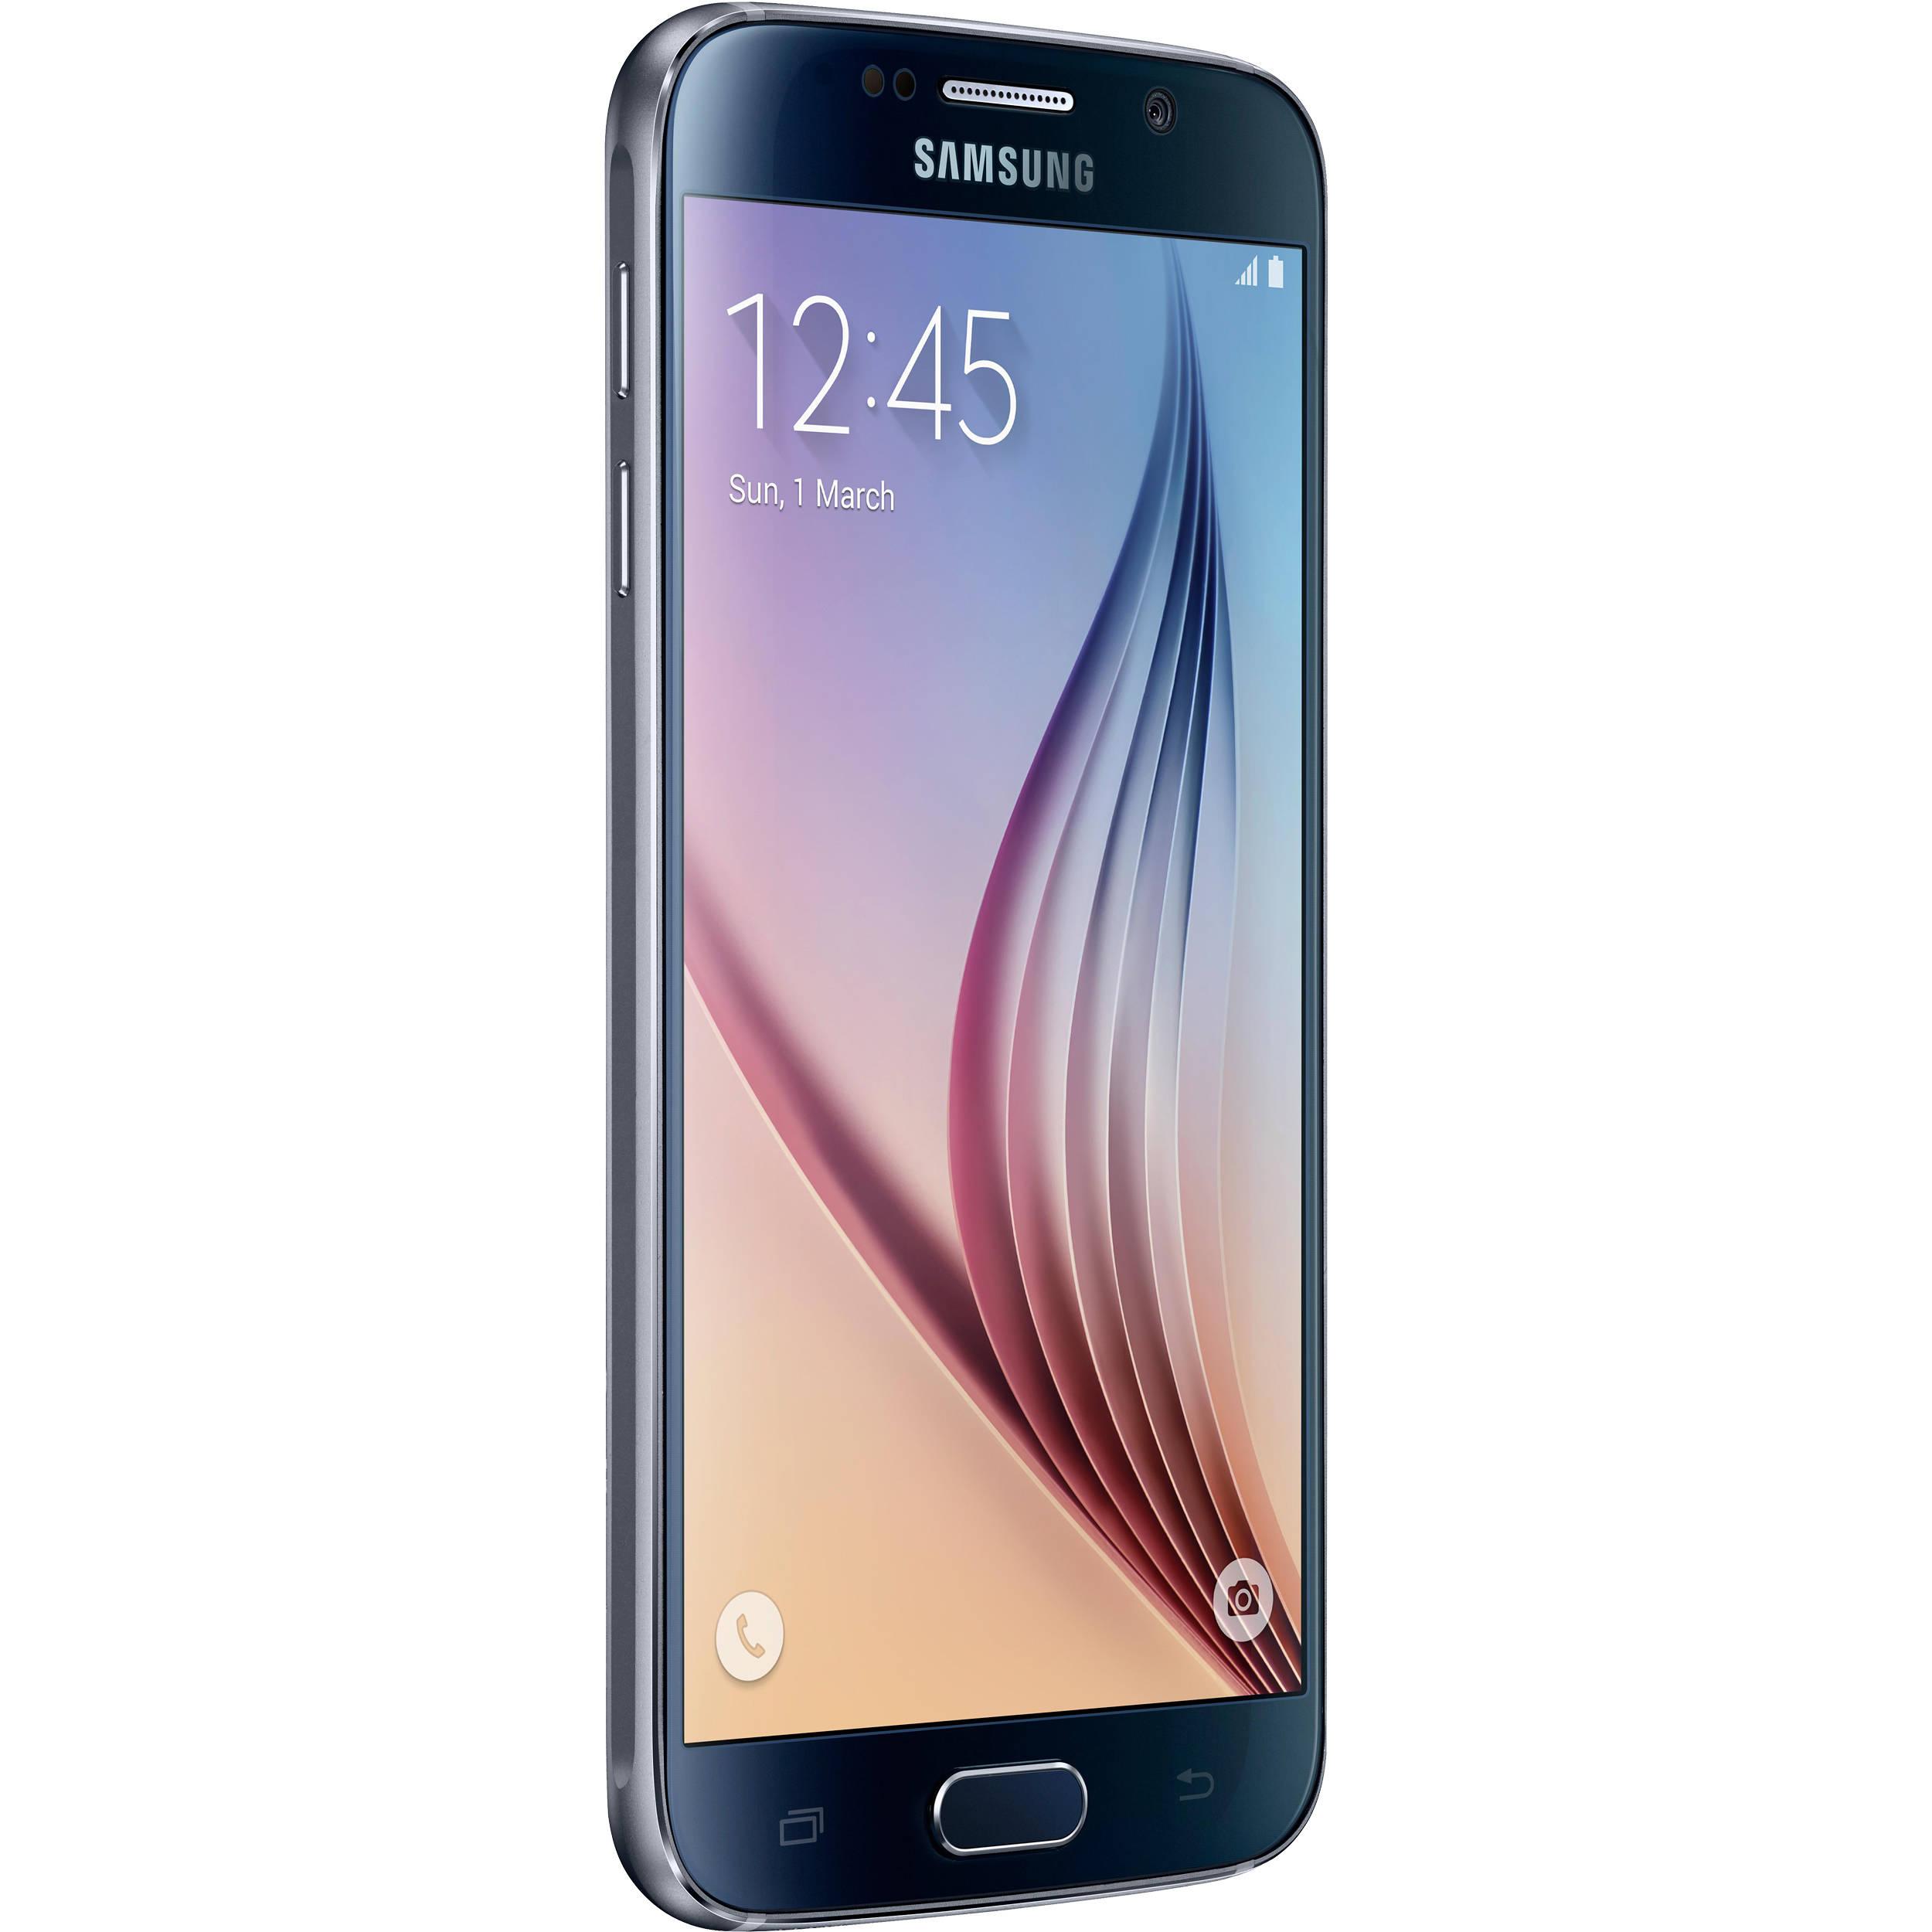 h samsung s6 samsung galaxy s6 sm g920i 64gb smartphone g920i 64gb blk b h